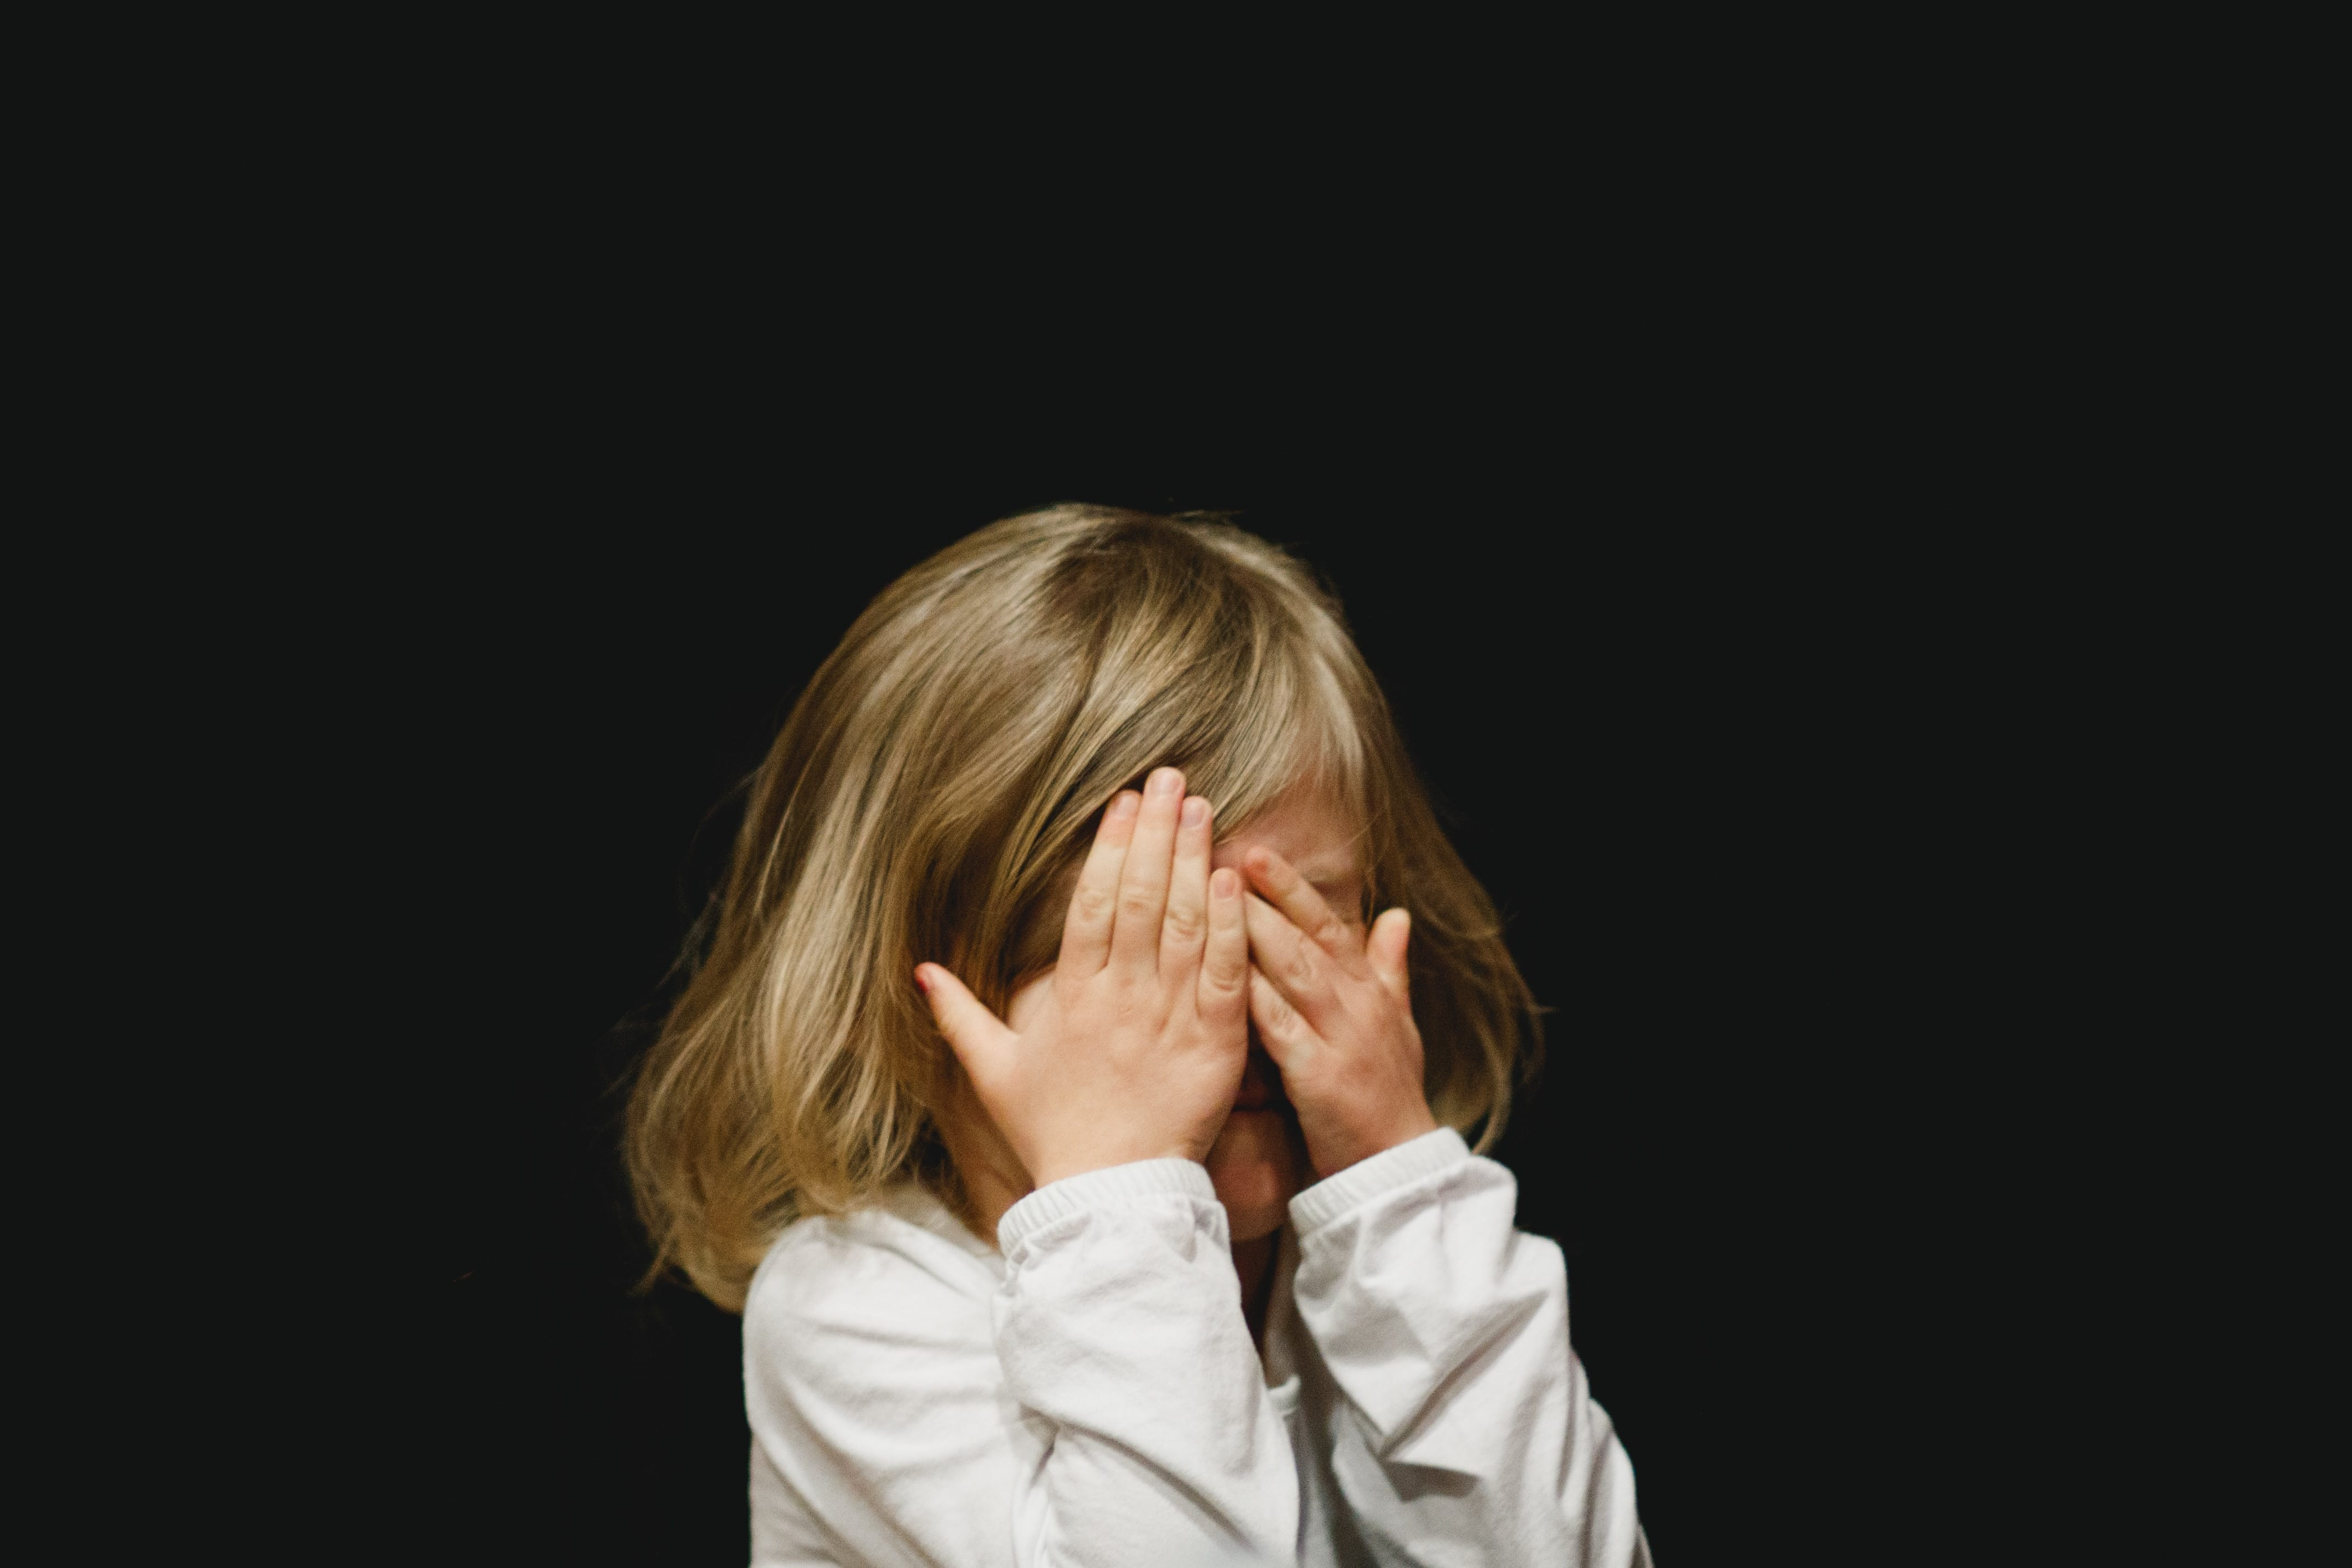 Adoptive Parents Claim Ukrainian Orphan Scammed Them